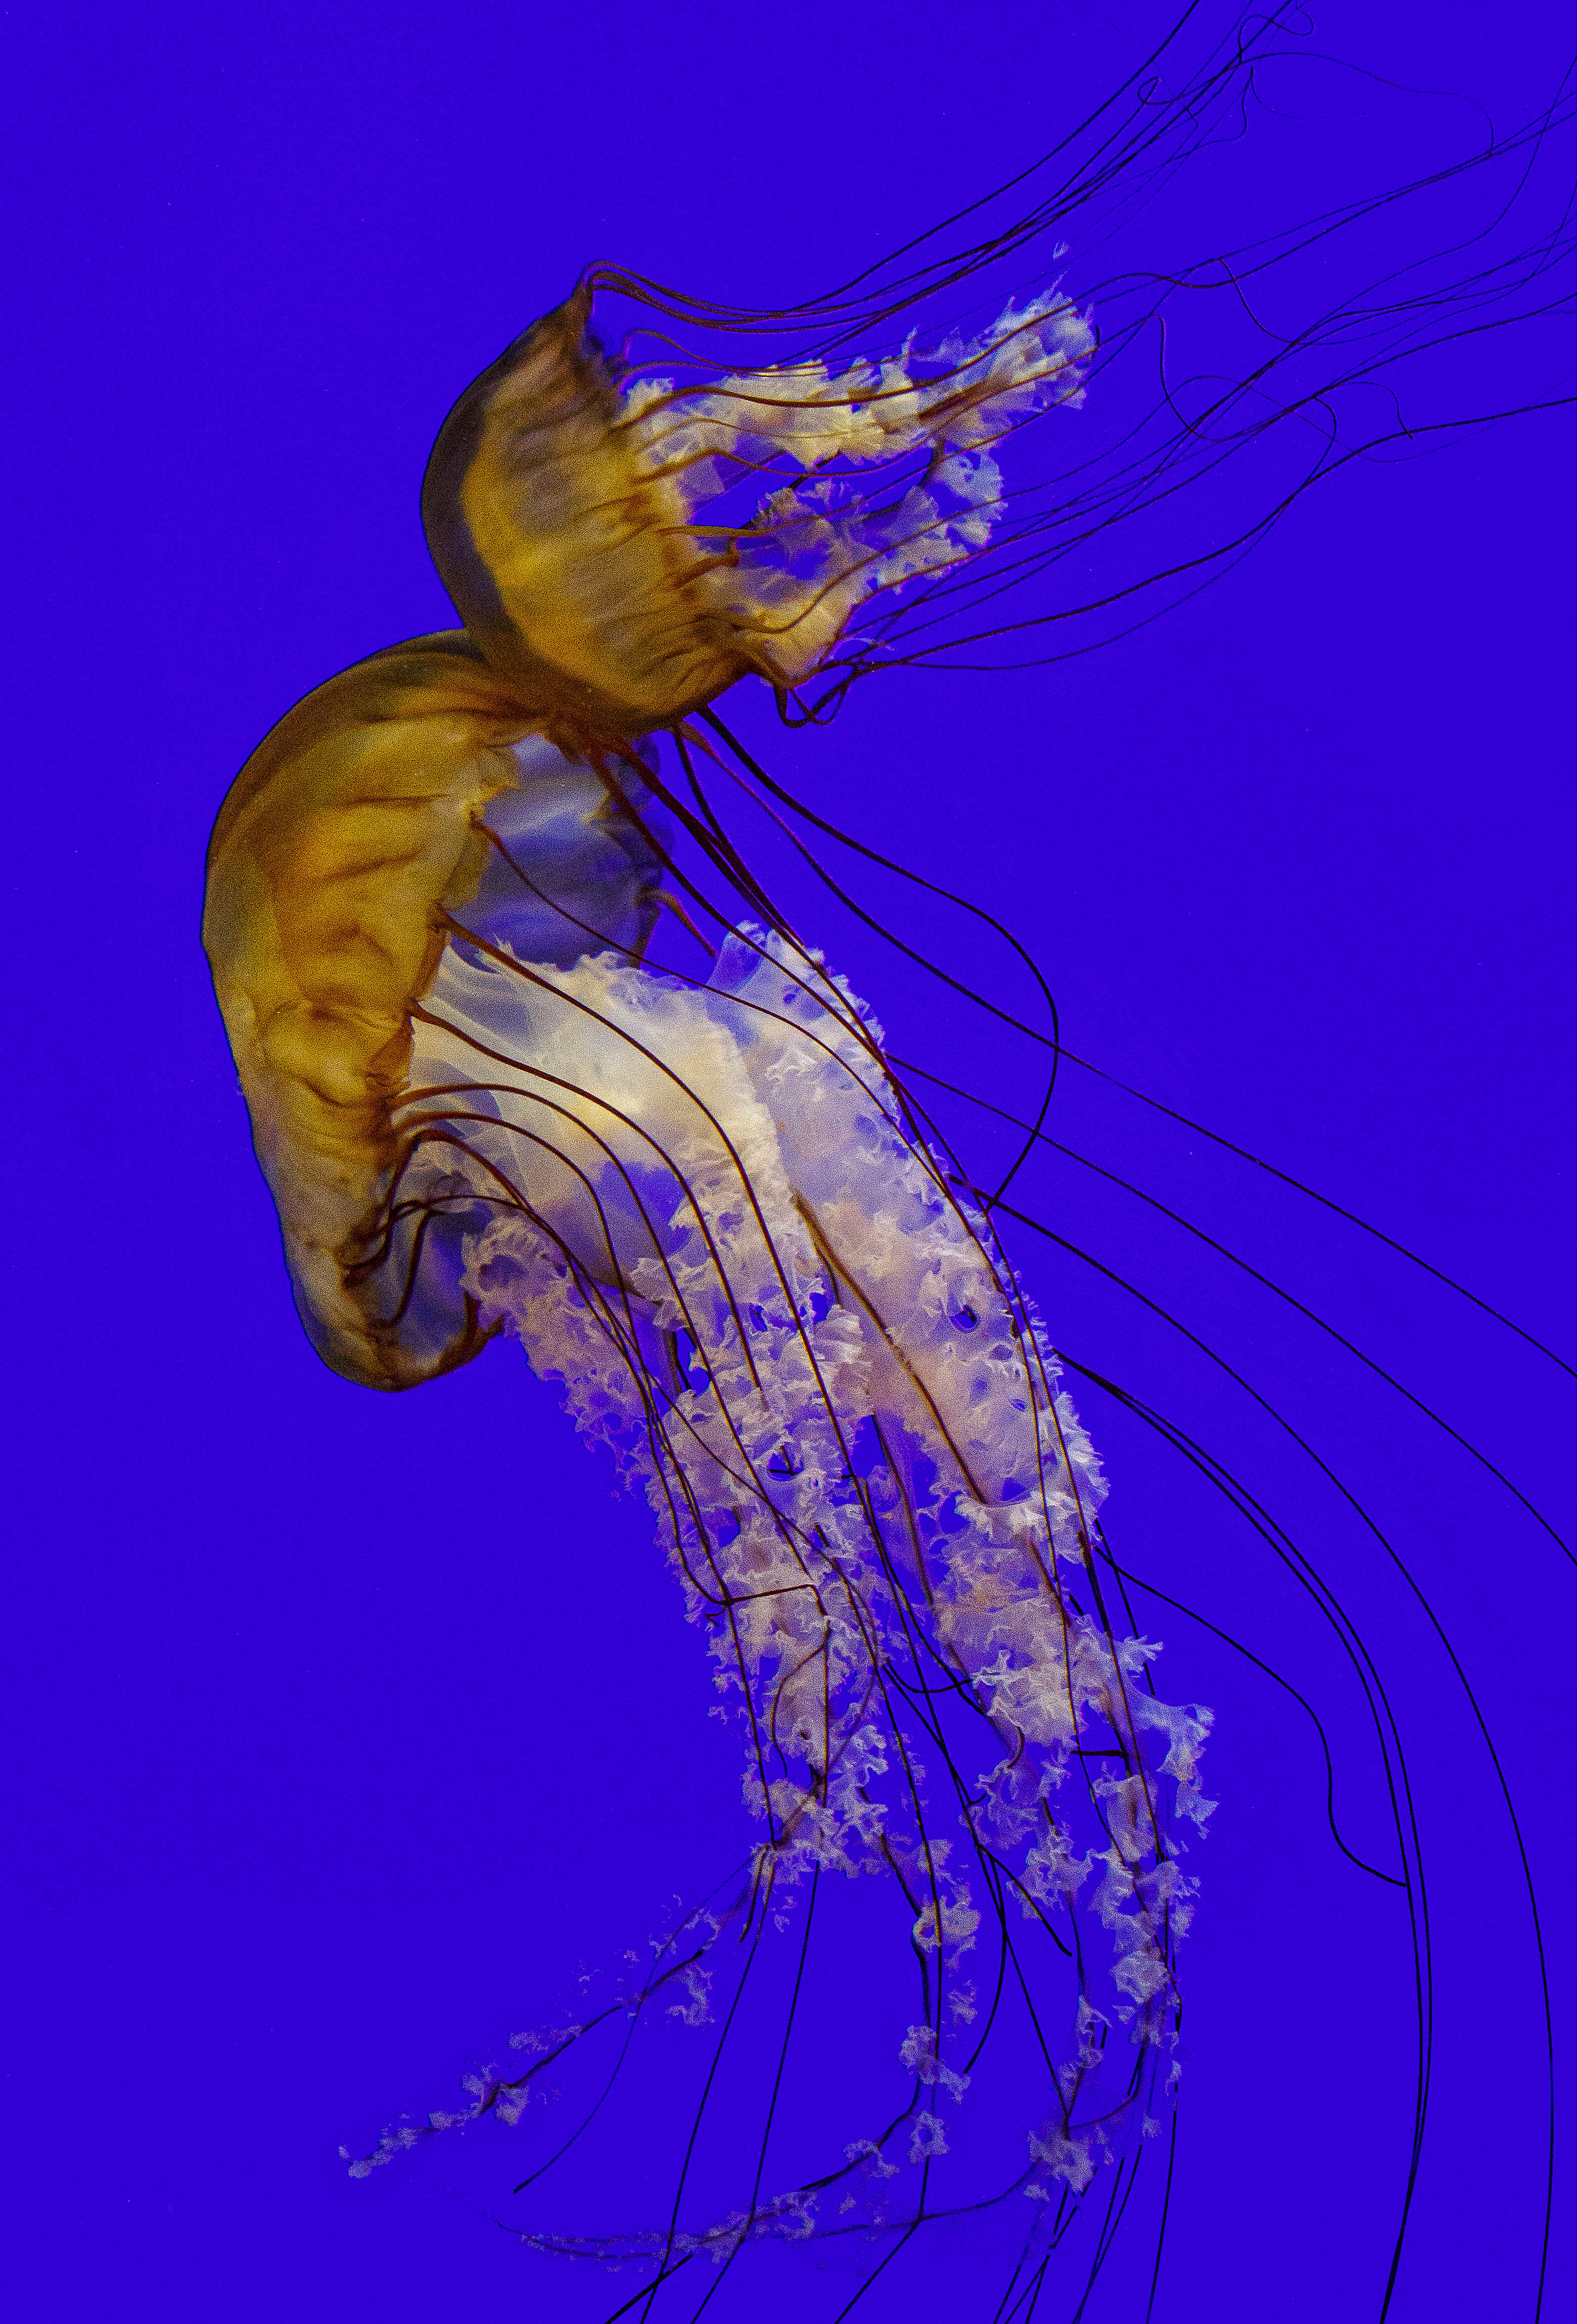 Sea Nettles couple